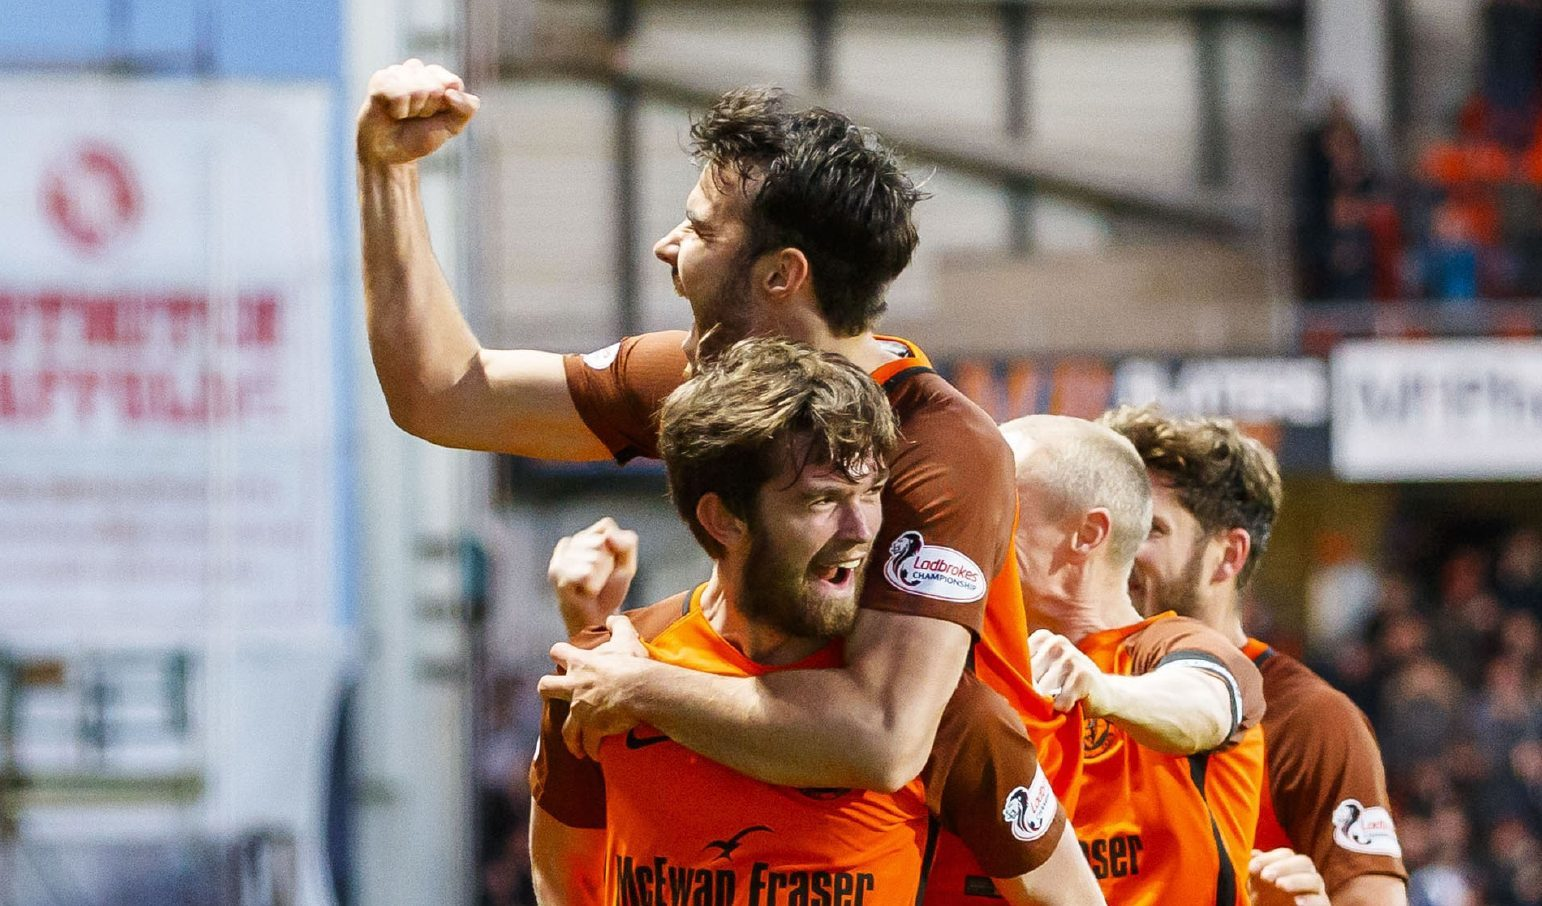 Scott Fraser congratulates Sam Stanton after his goal.